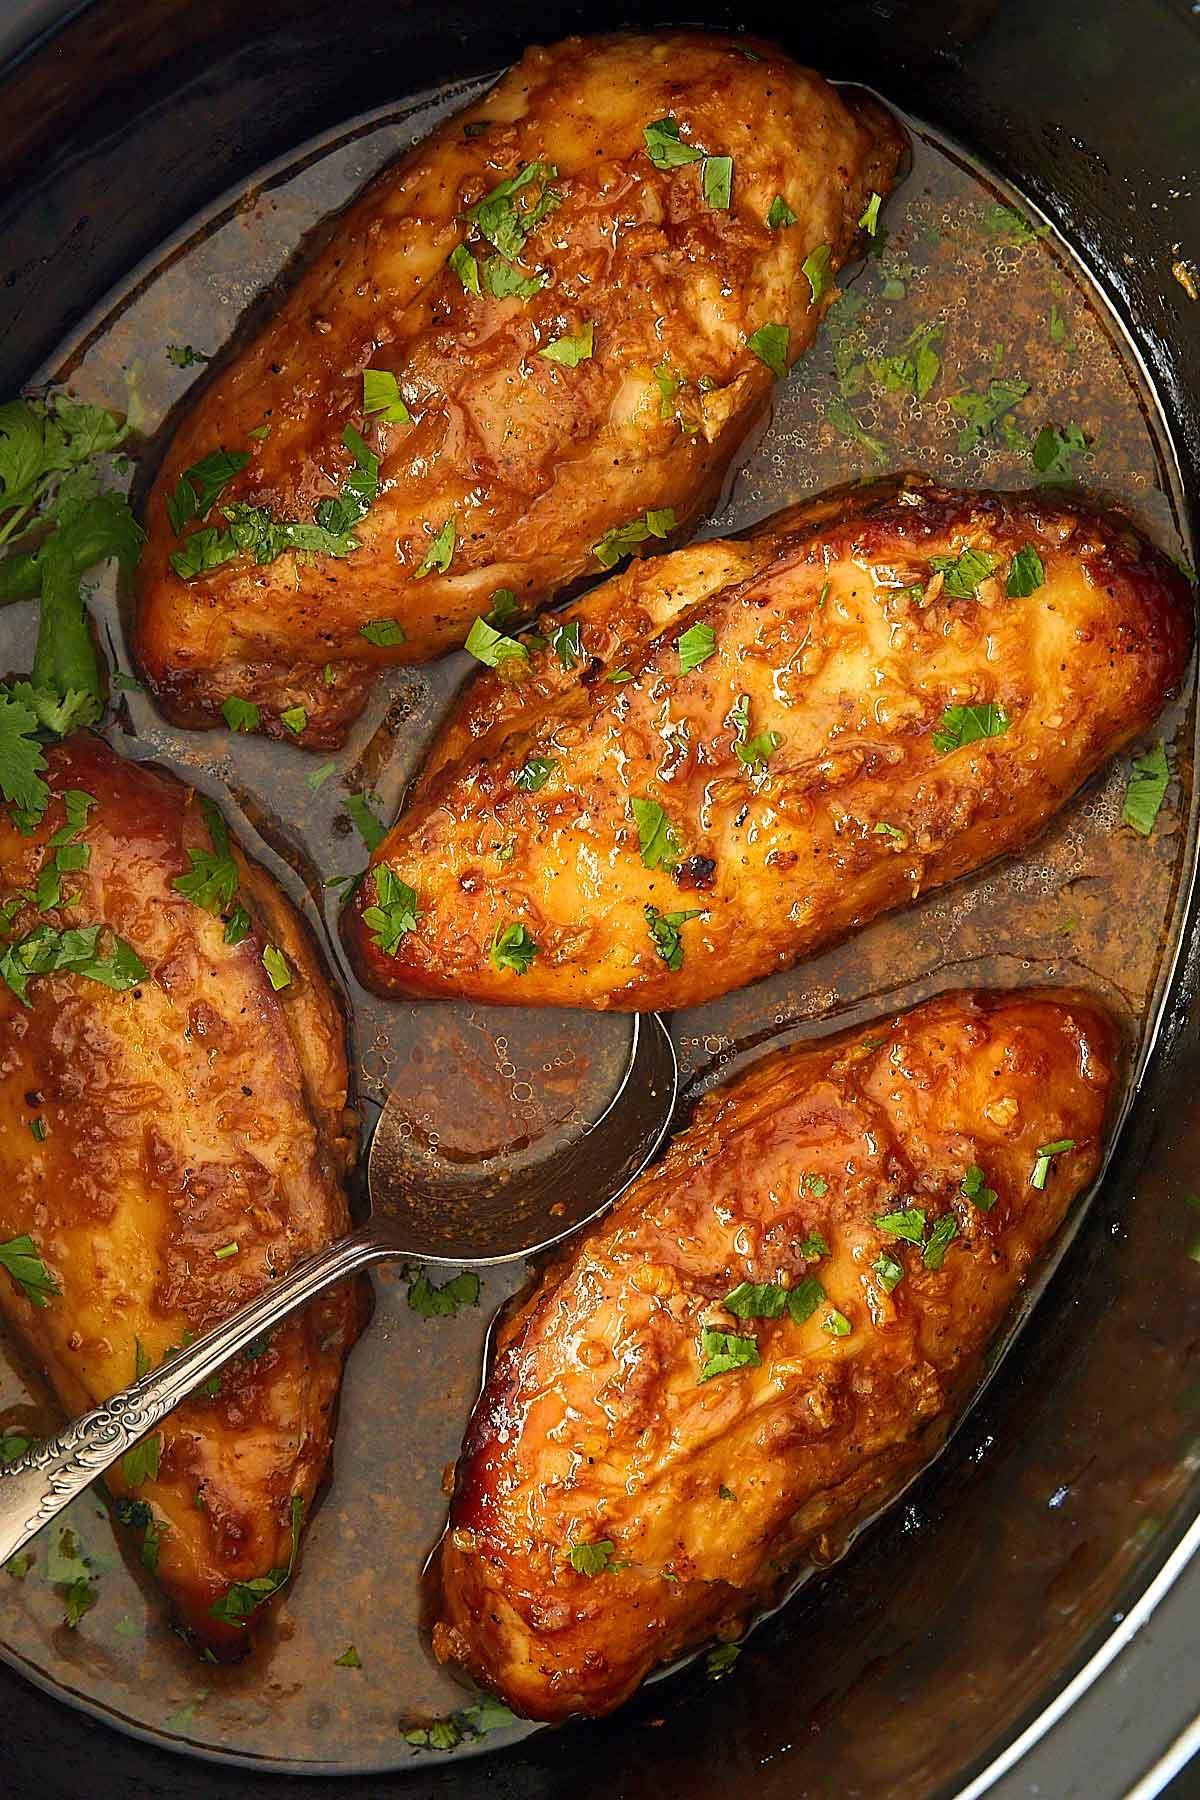 Slow Cooker Chicken Breasts inside slow cooker.